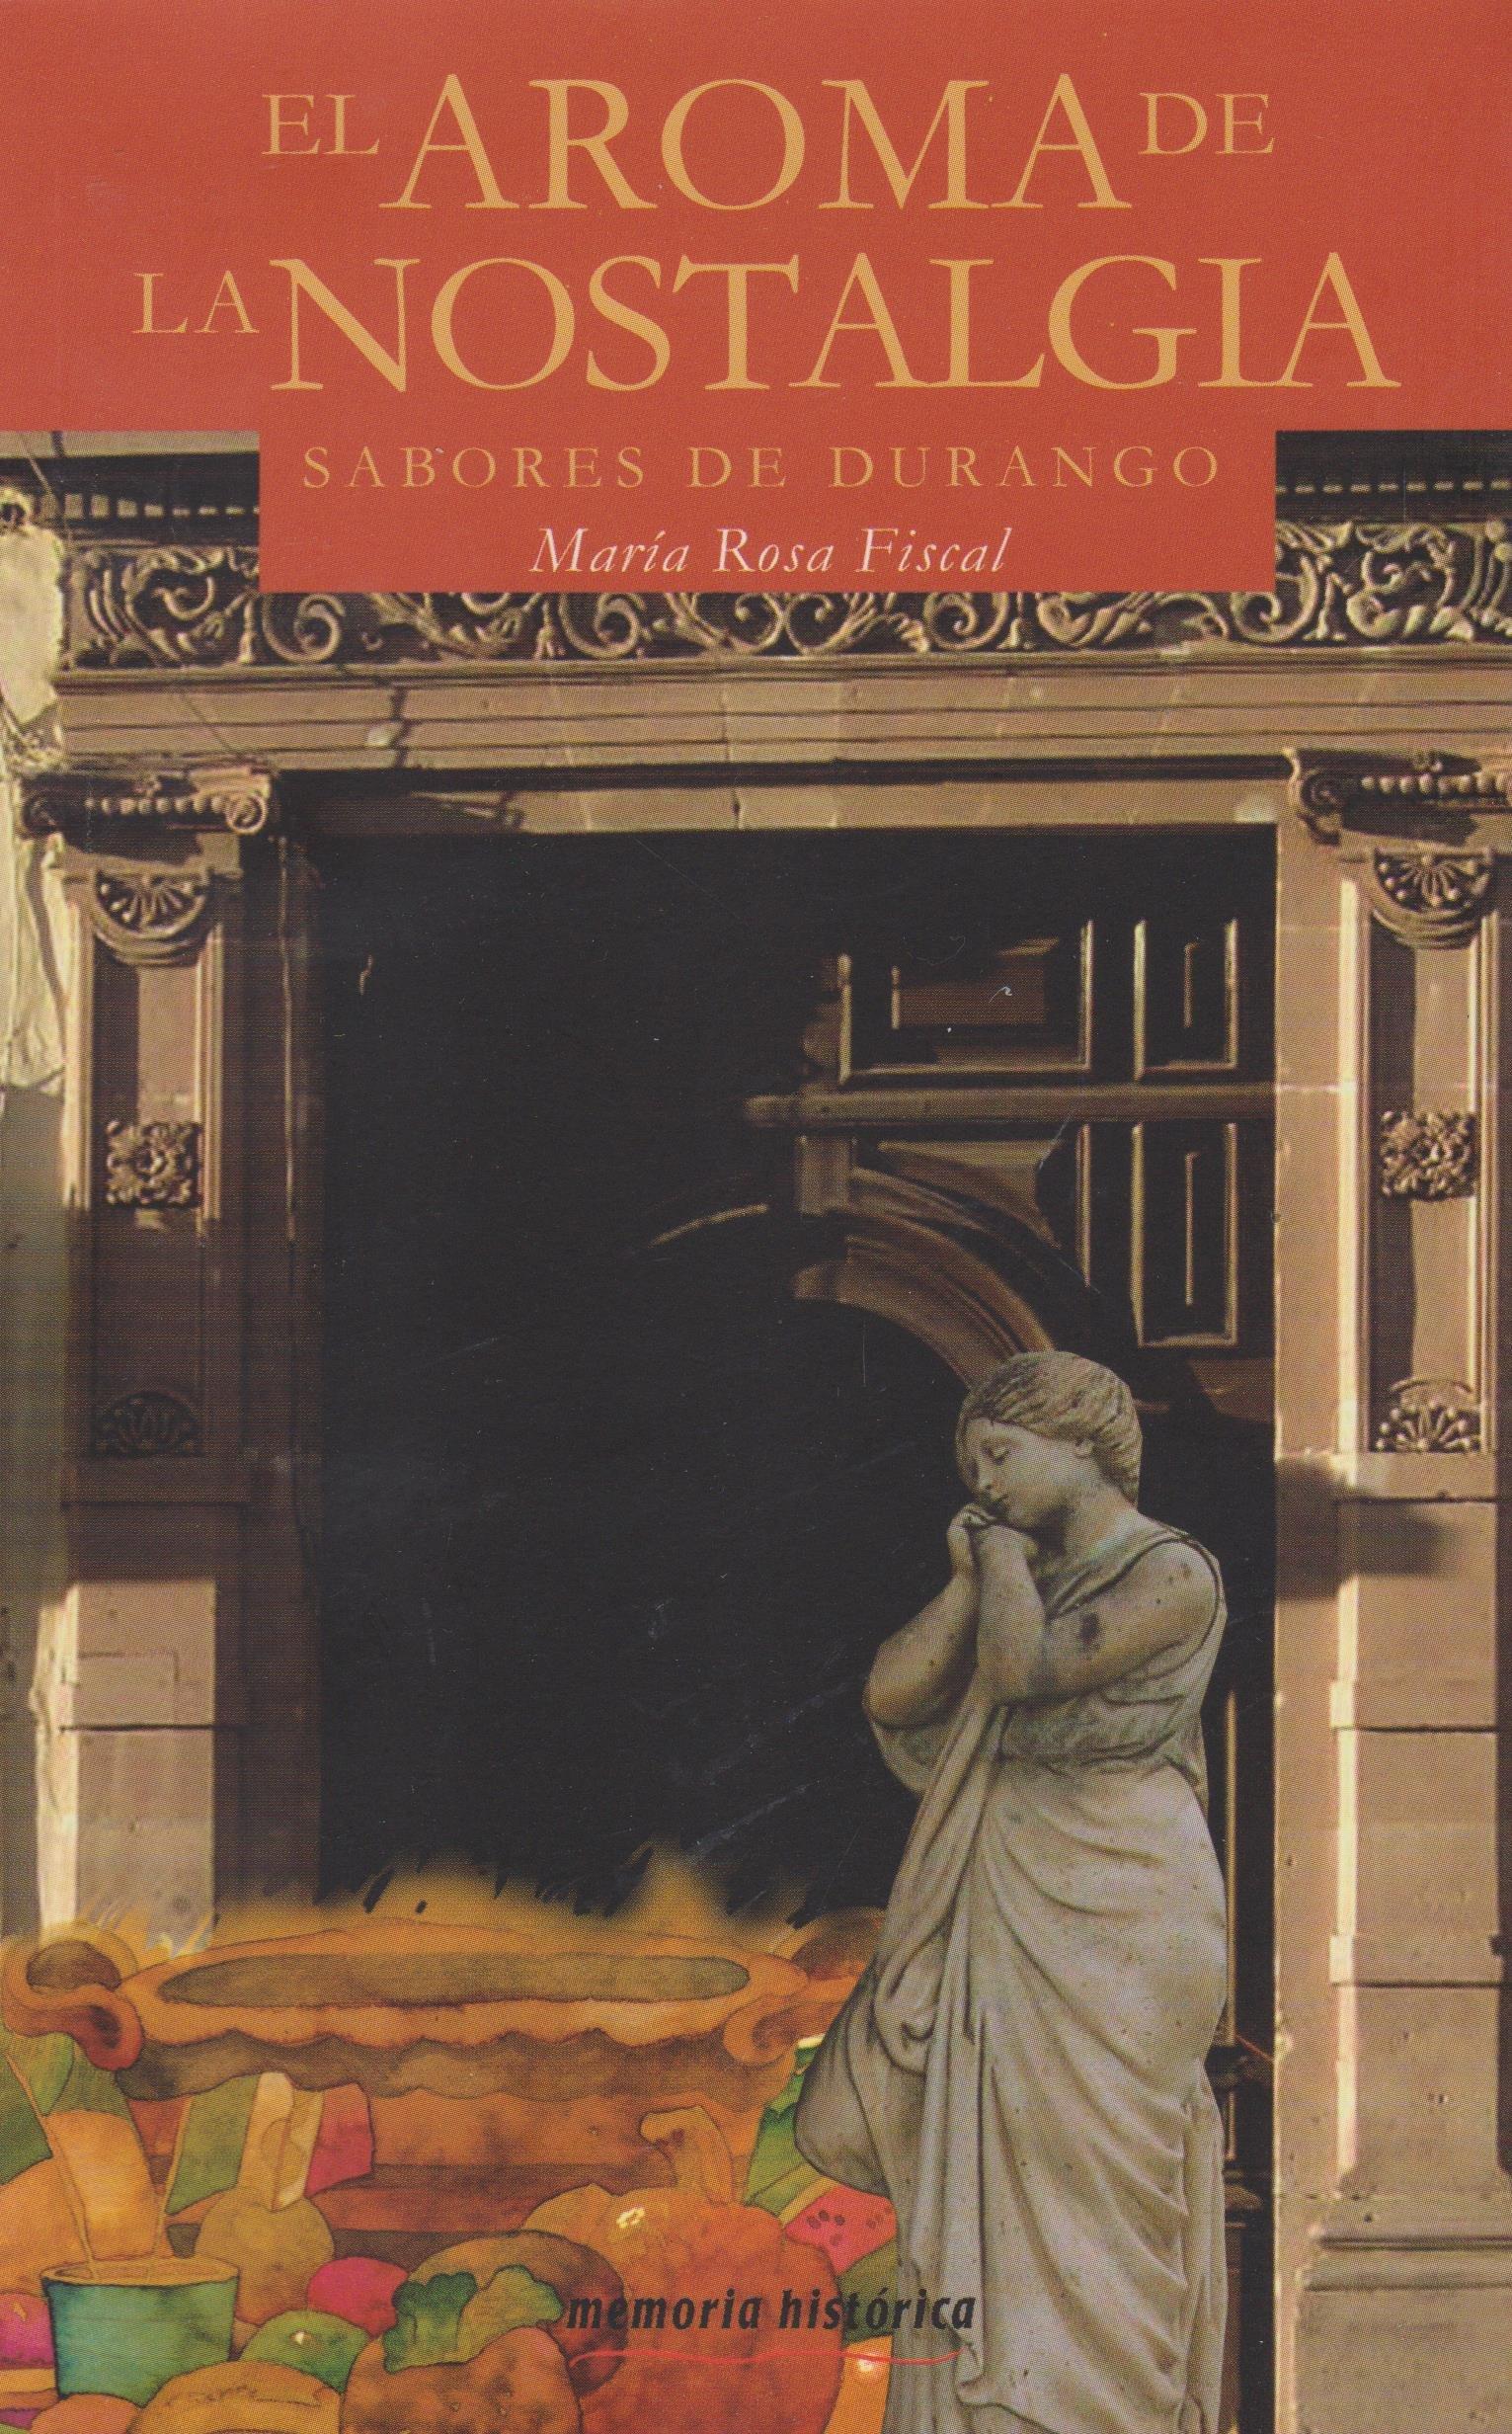 El aroma de la nostalgia. Sabores de durango (Spanish Edition): Maria Rosa Fiscal: 9789703507788: Amazon.com: Books